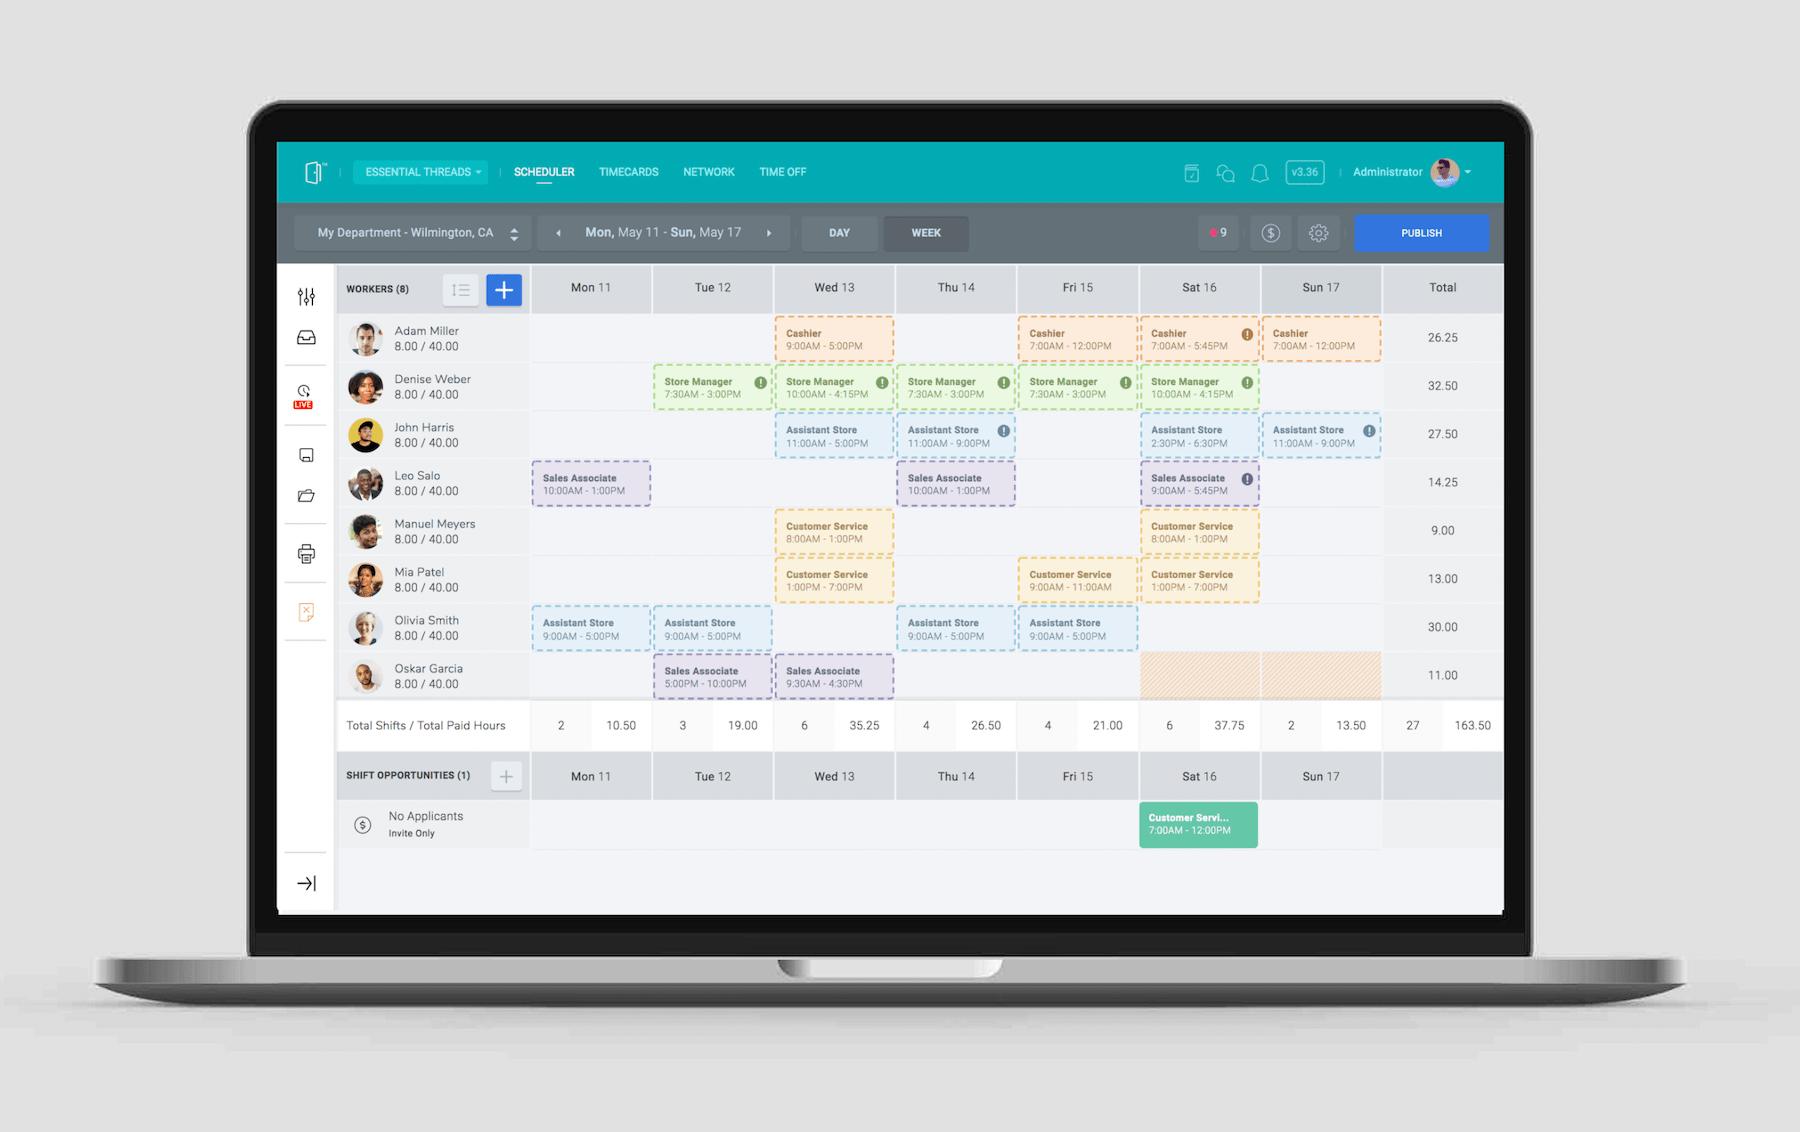 SocialSchedules Software - Manager's Weekly Scheduler